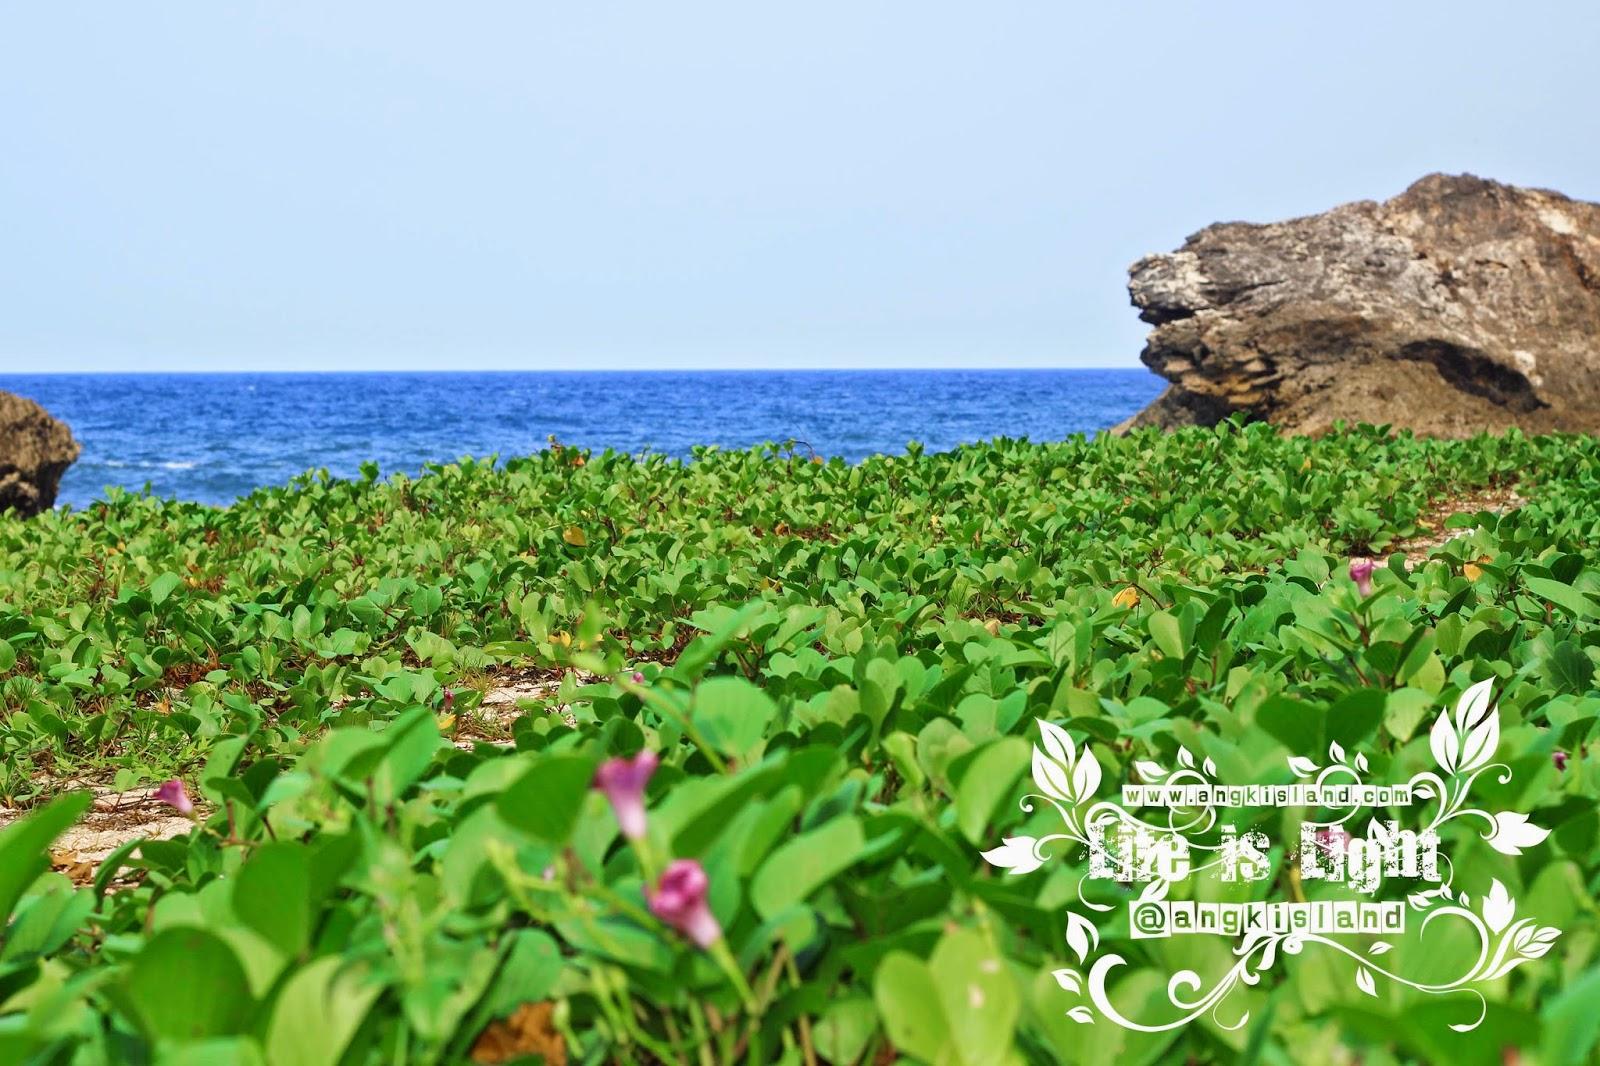 Pantai Perawan gunung kidul wohkudu